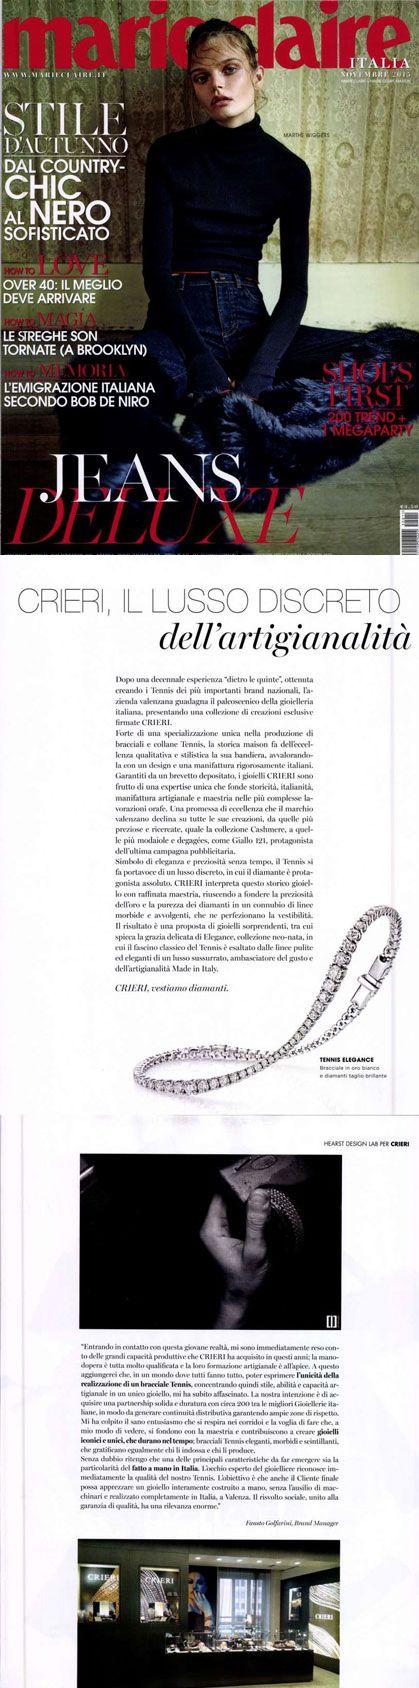 ❖Visto su #MARIECLAIRE – 01/11/2015❖ #Elegance collection. #tennis #bracelets #trendy #jewelry #fashion #gold #valenza #crieri #vestiamodiamanti #tennispassion #tennisclub #glamour #chic #lifestyle